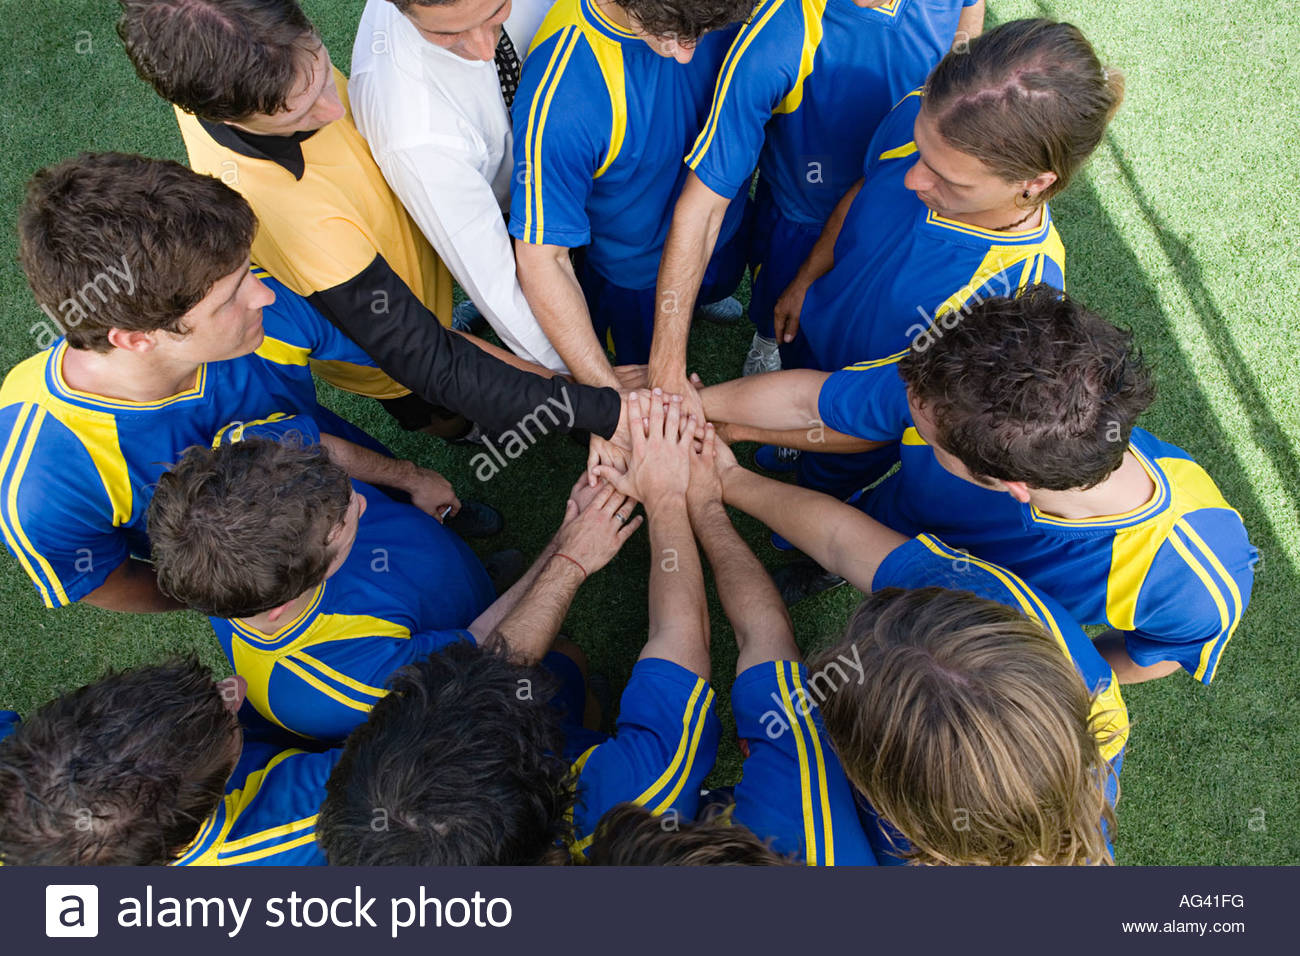 Footballers bonding - Stock Image